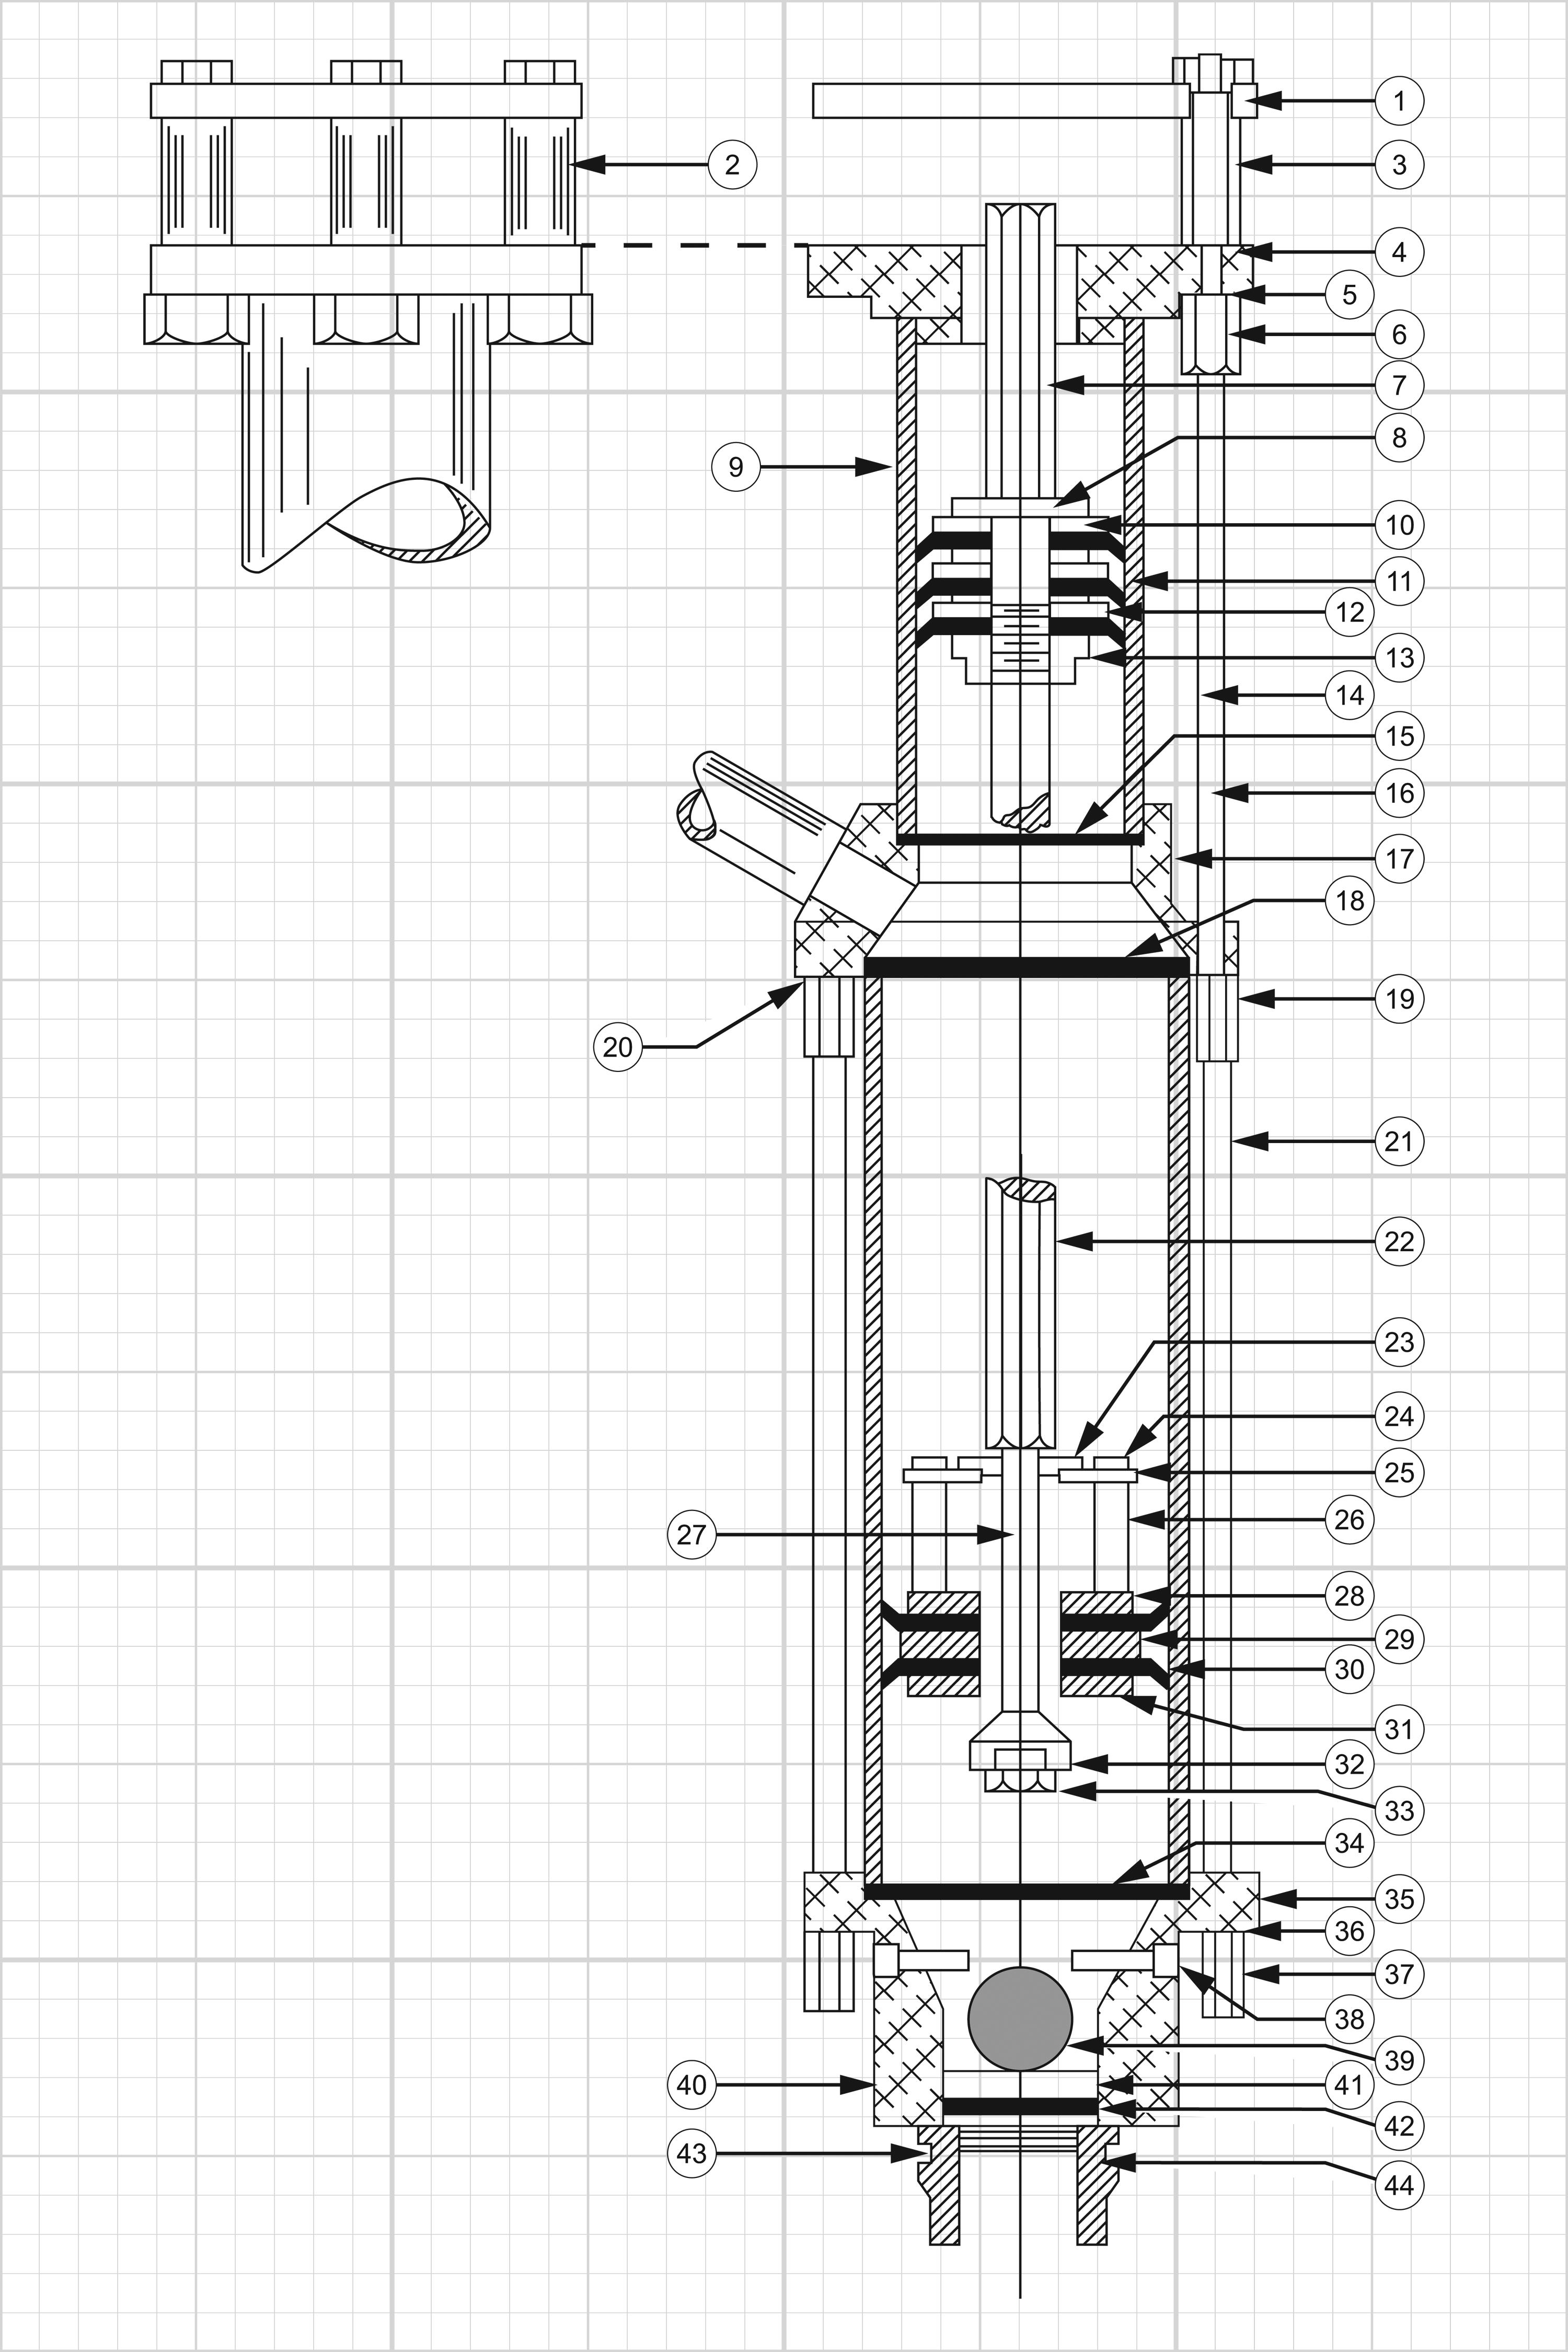 4 Inch Pump Drawing for Sprayer